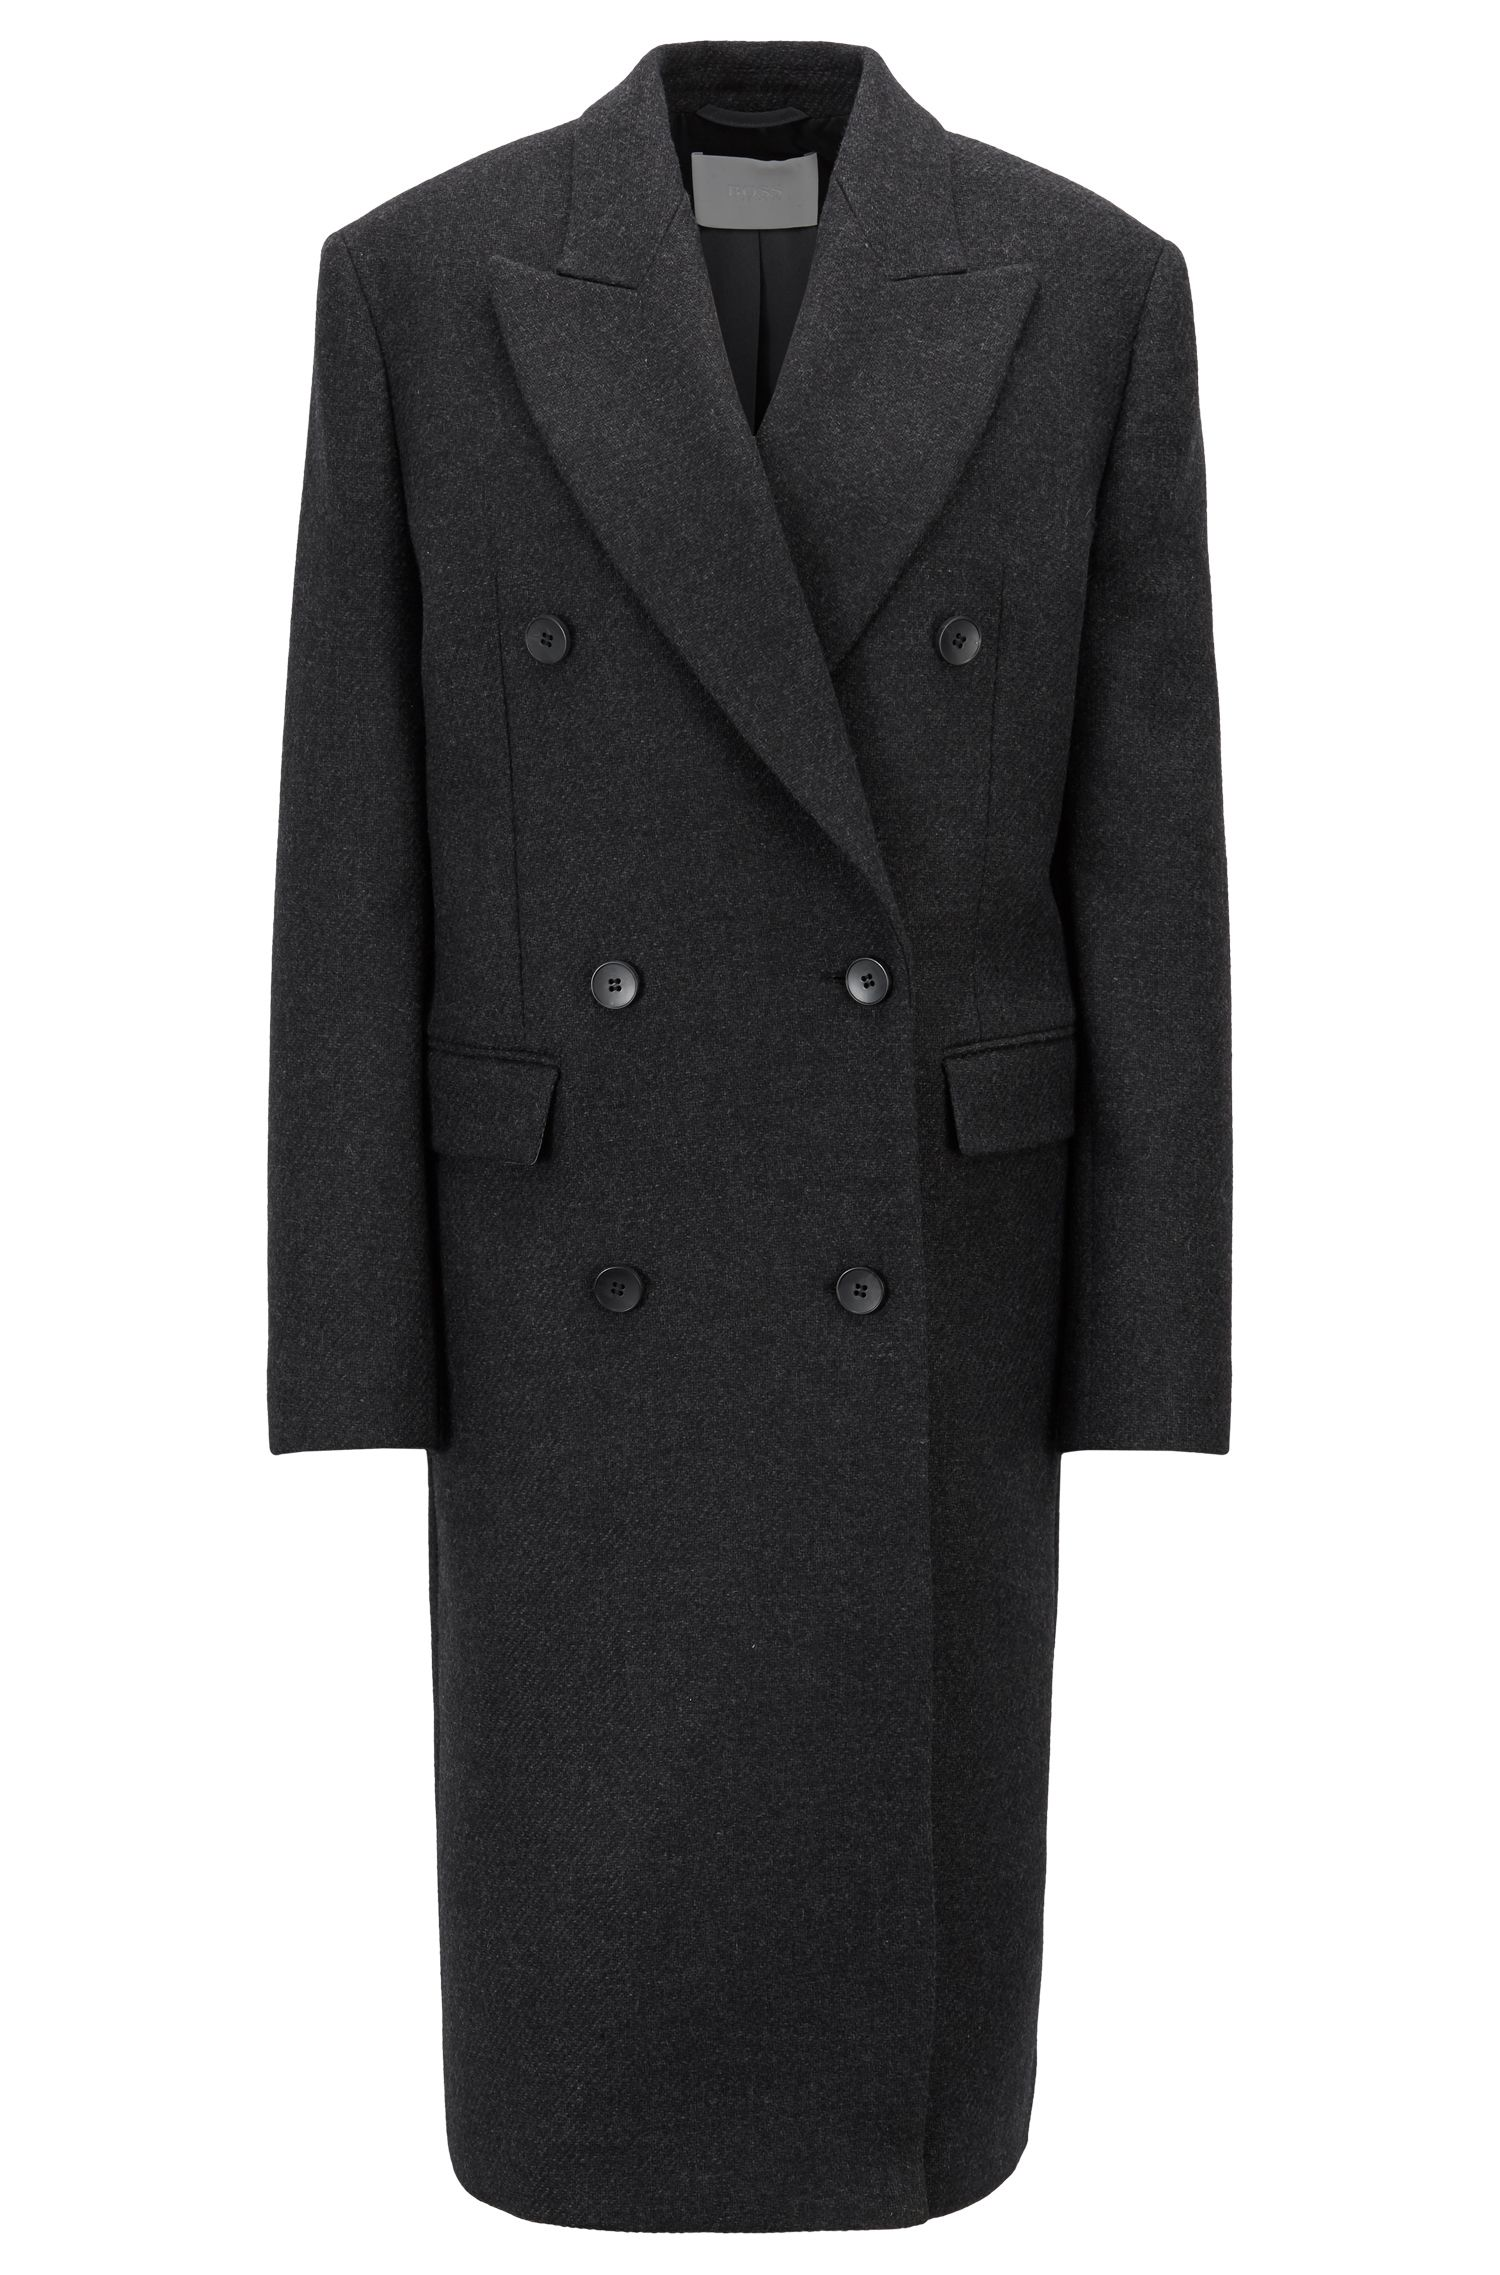 Double-breasted coat in an Italian wool blend, Black